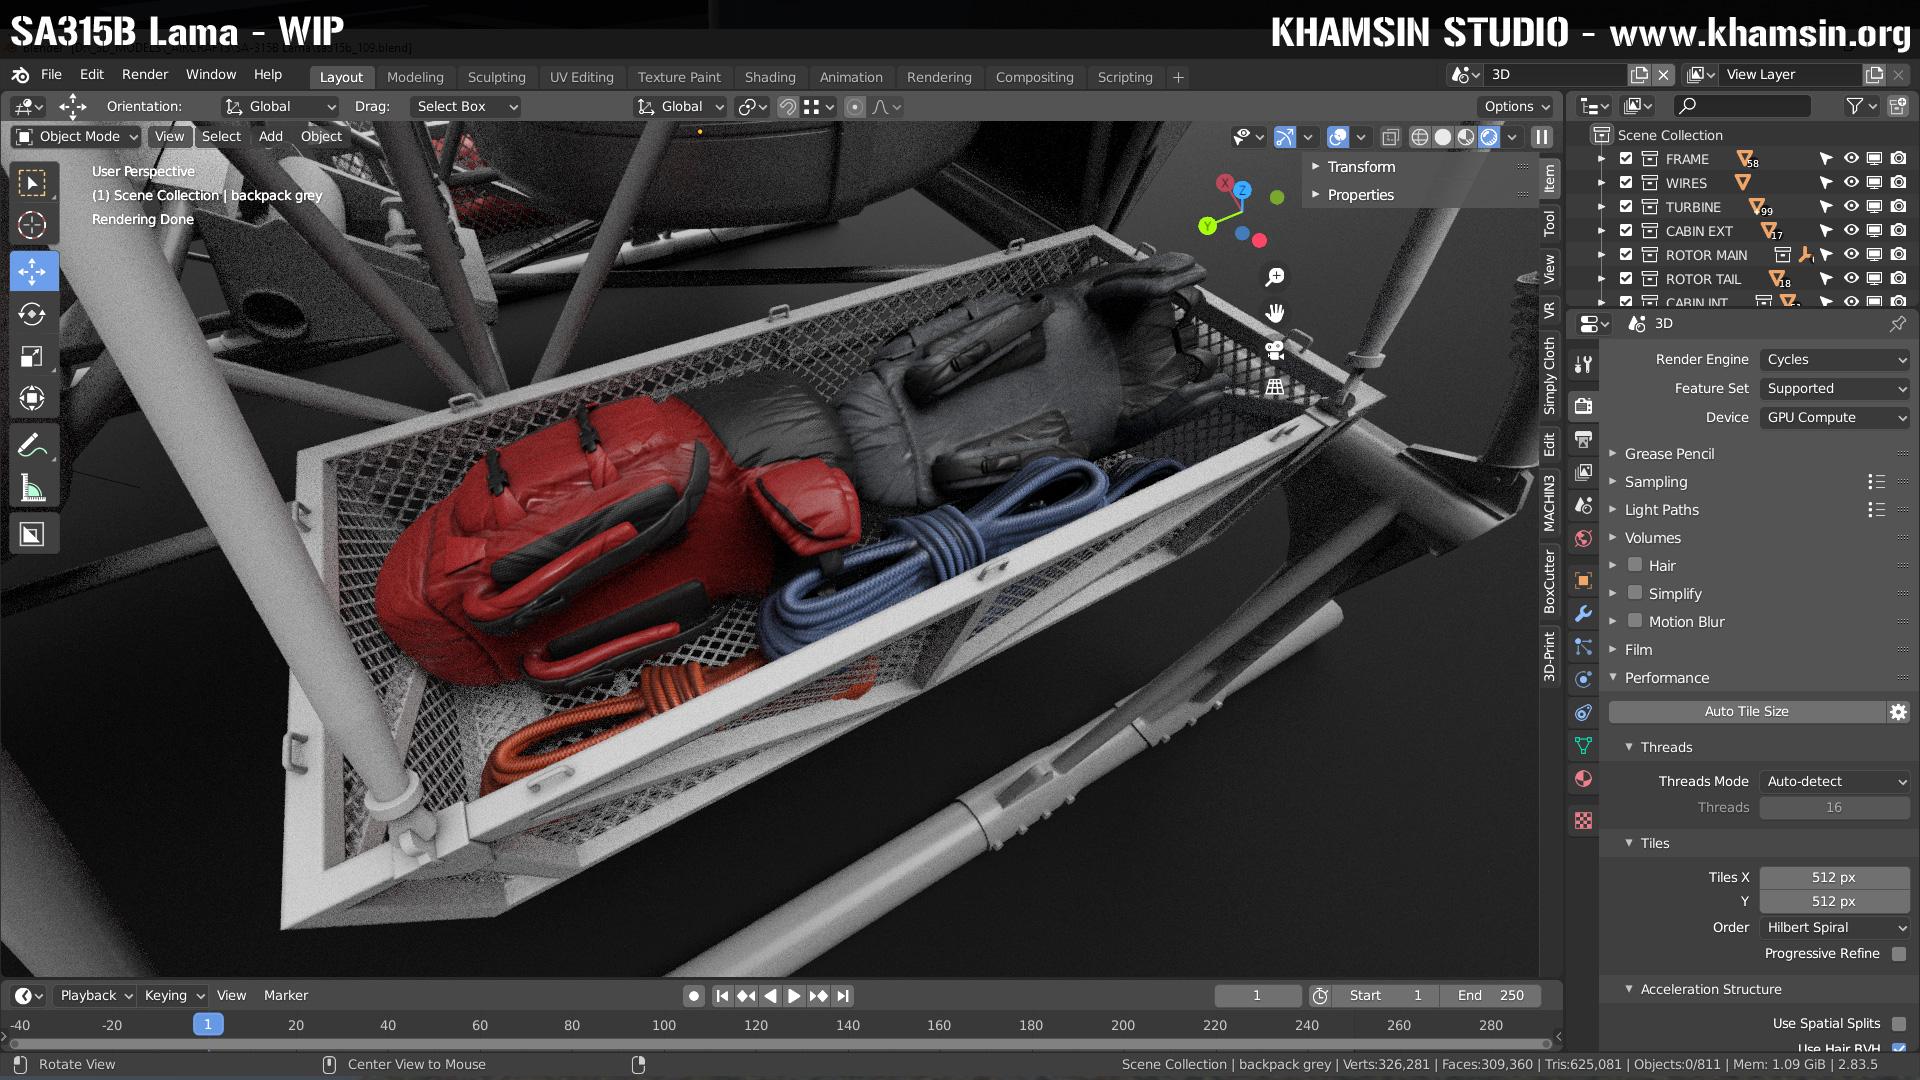 khamsin_SA315b_42_HD.jpg